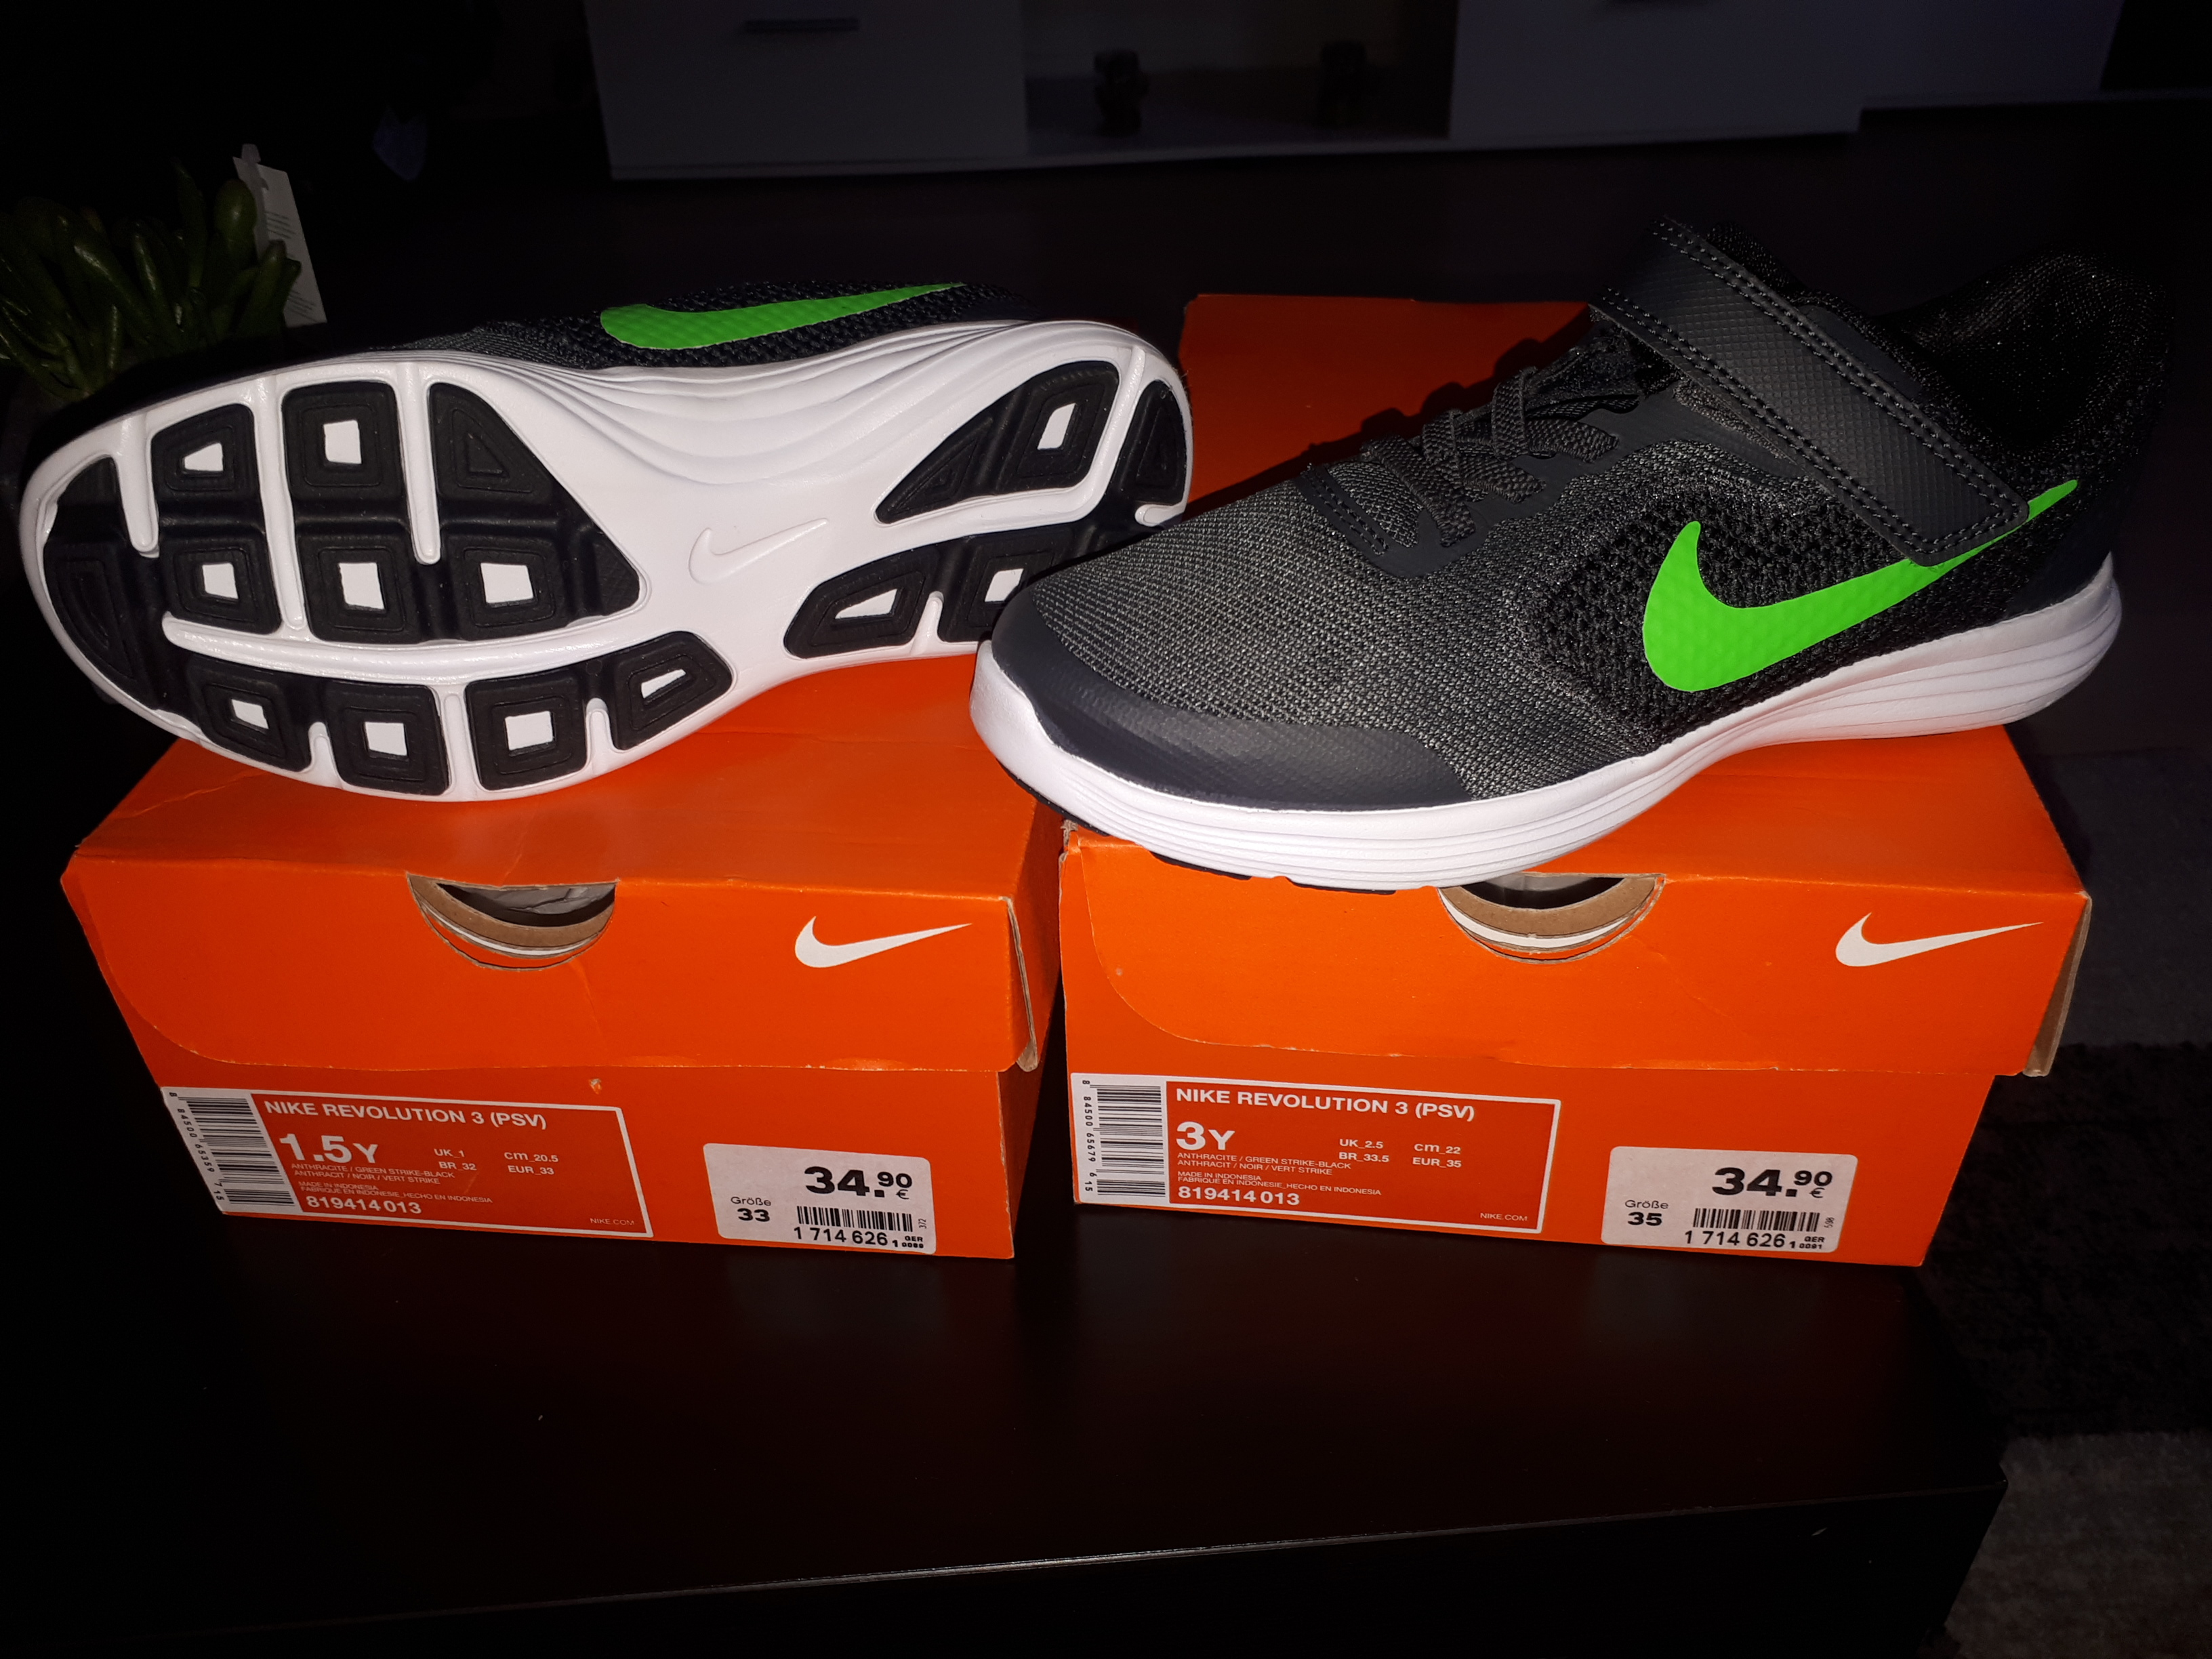 Nike Revolution 3 KIND